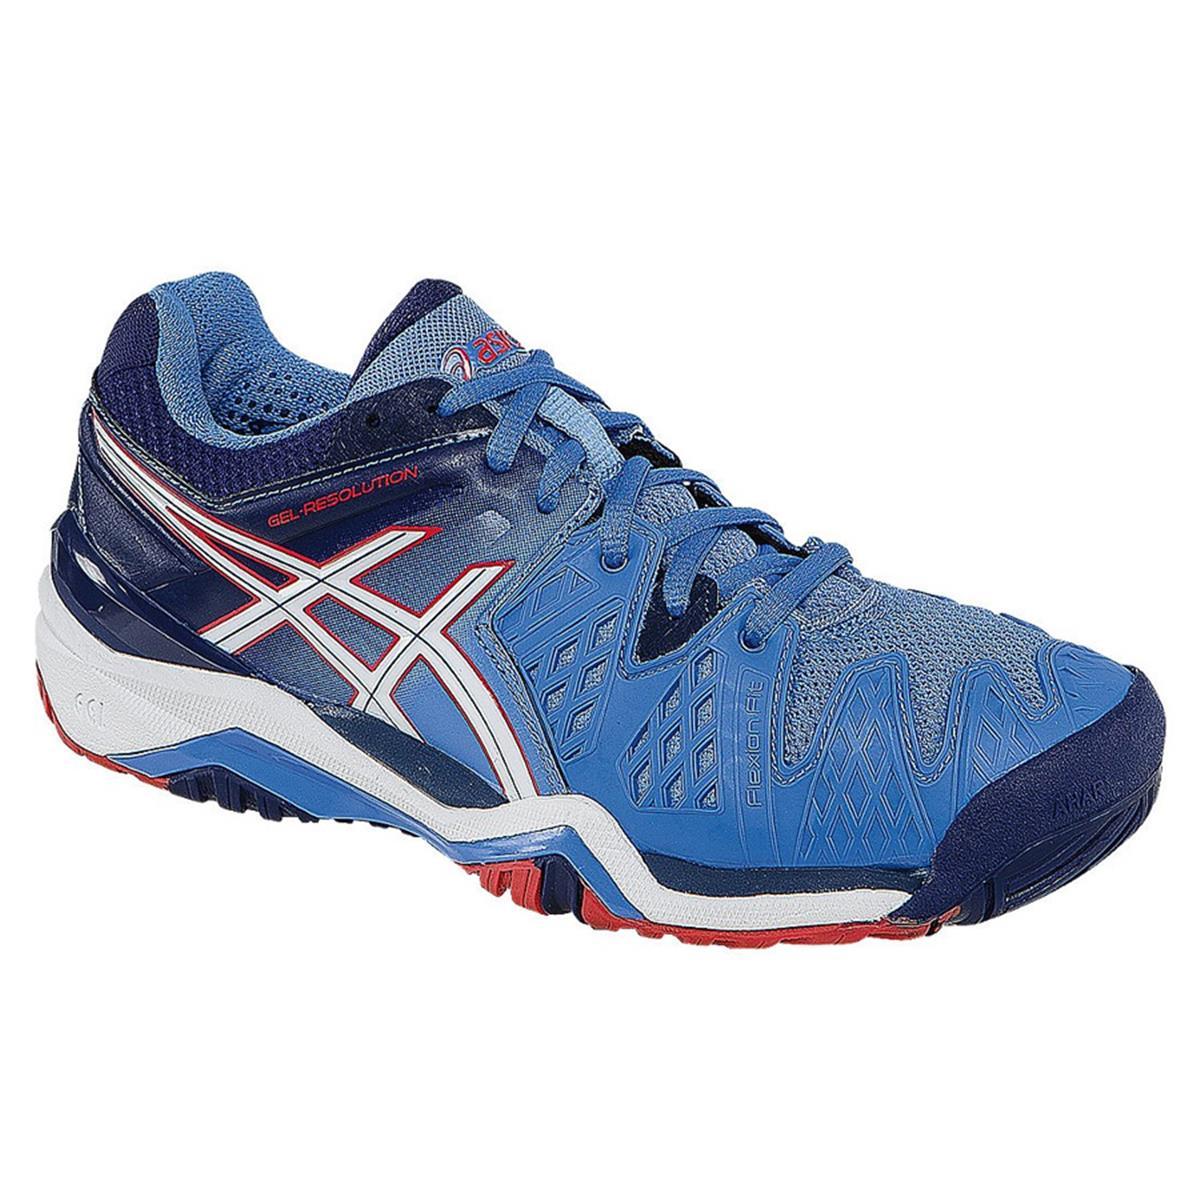 c2bbd06fc884 Asics Gel Resolution 6 Womens Tennis Shoes (Powder Blue ...